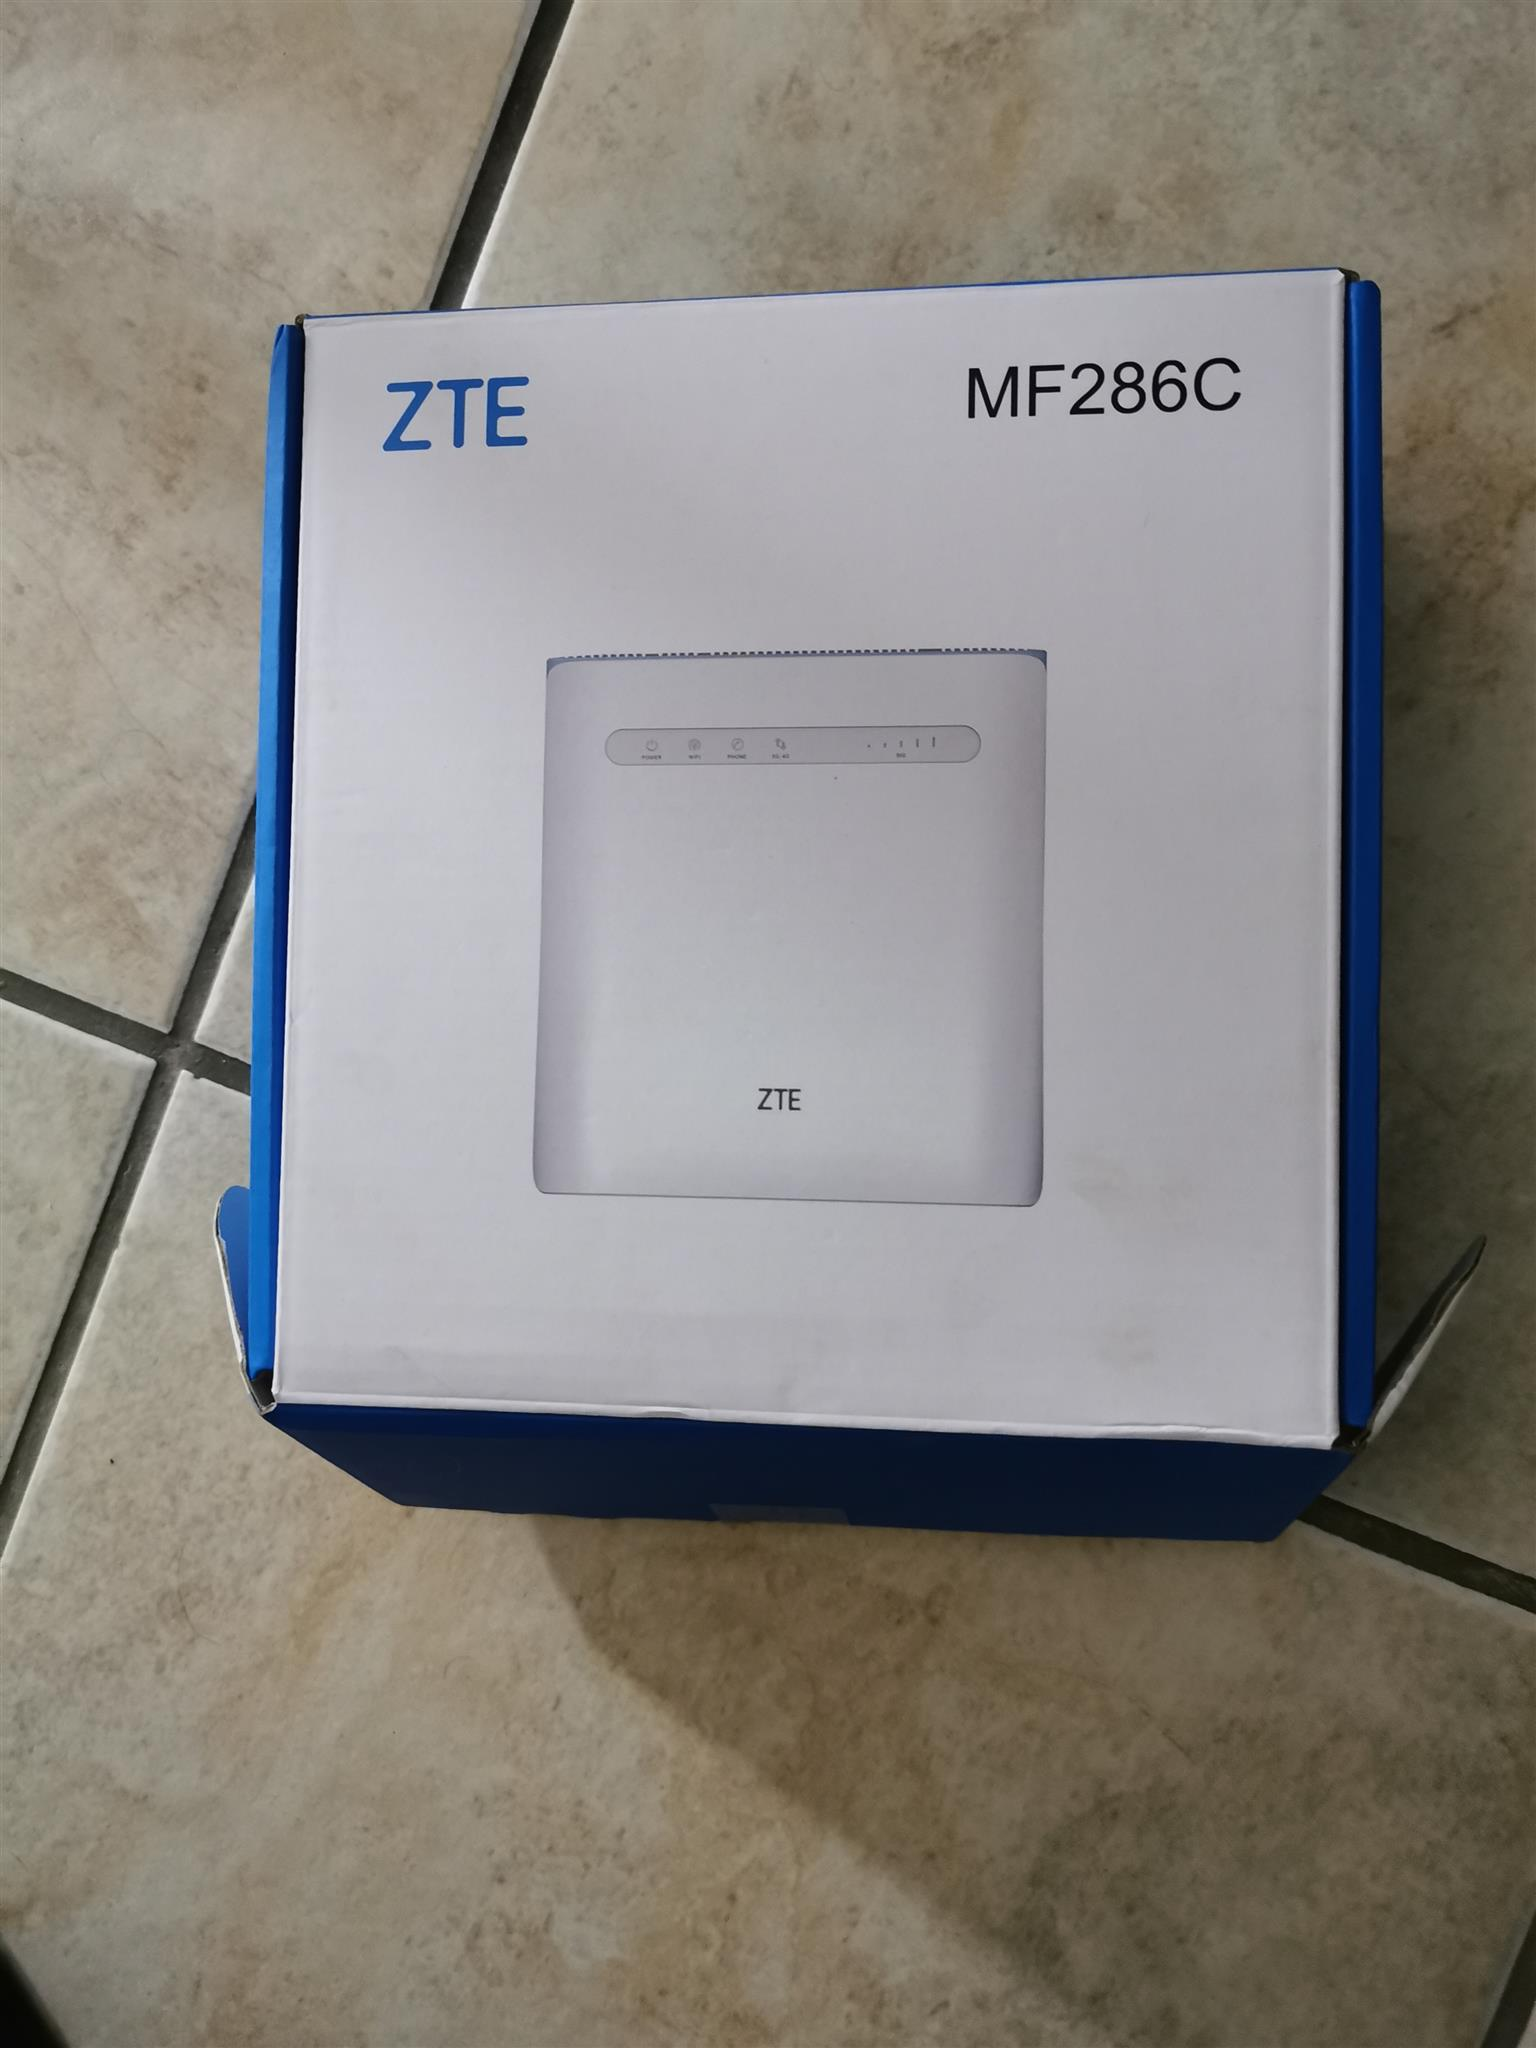 ZTEMF286C ROUTER NEW